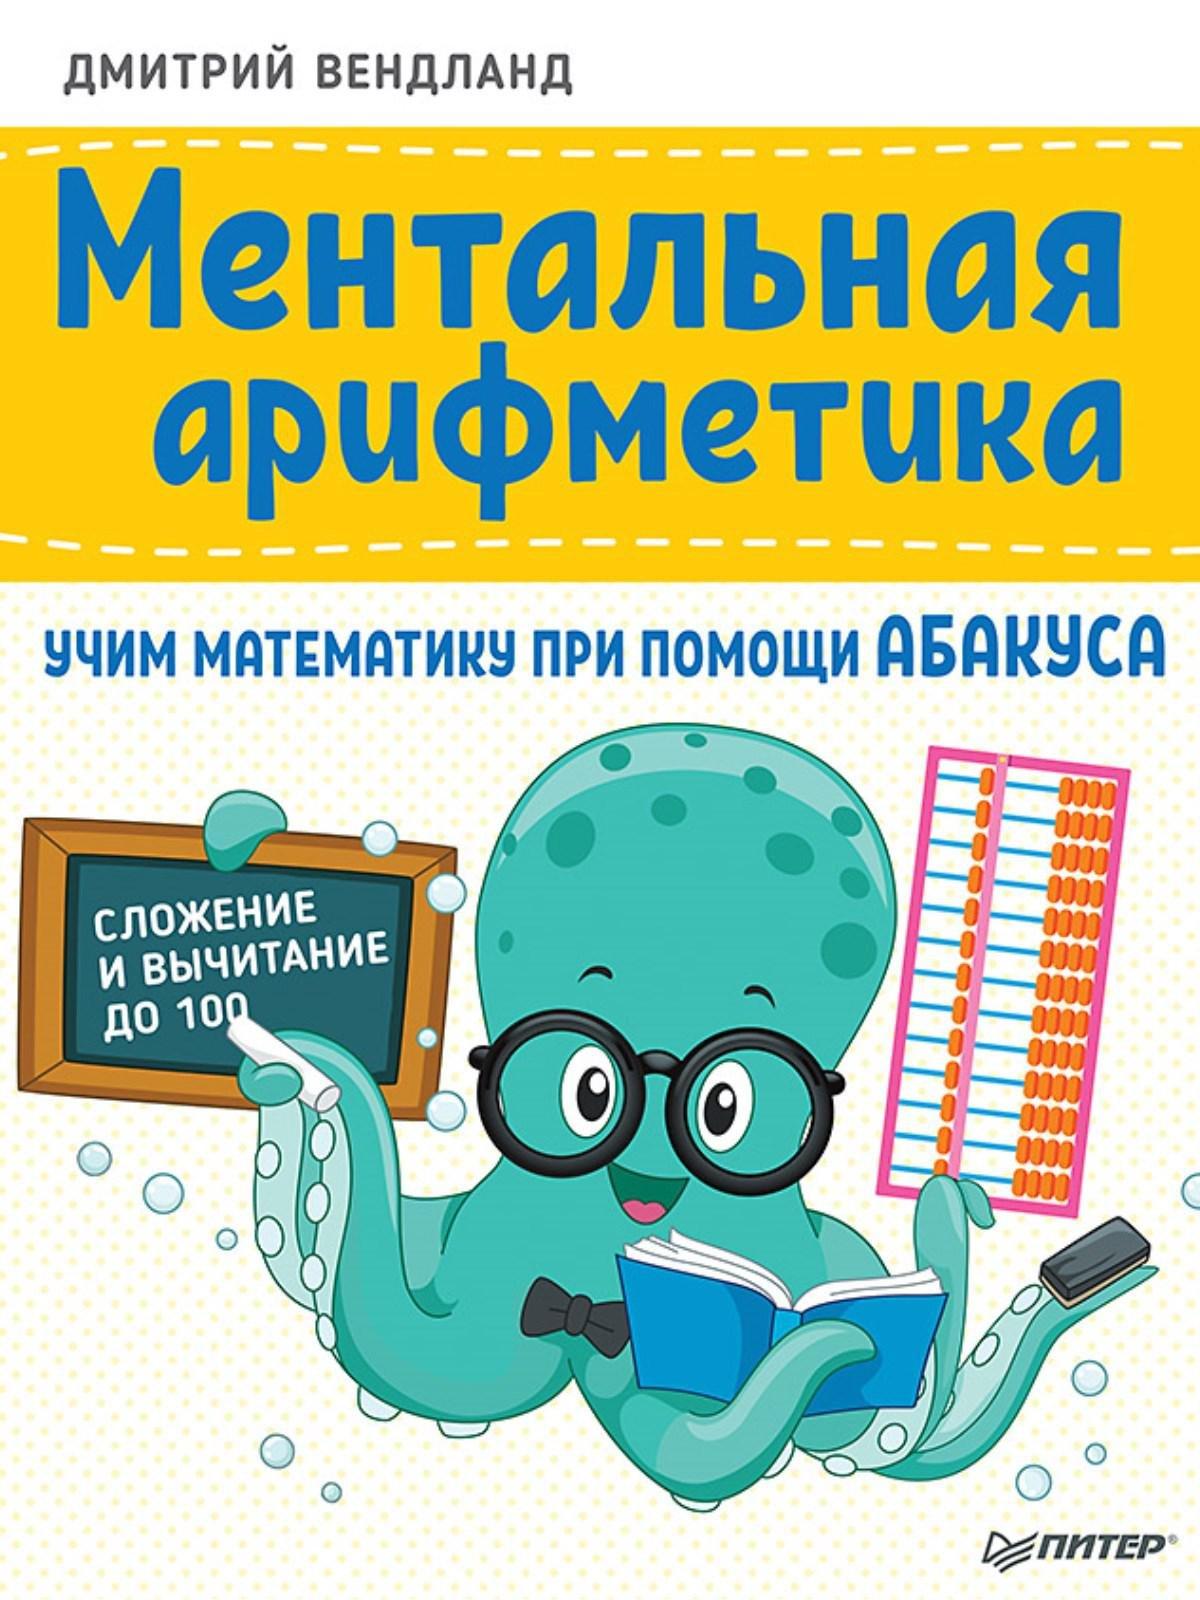 ментальная арифметика учим математику при помощи абакуса сложение и вычитание до 100 Ментальная арифметика Учим математику при помощи абакуса